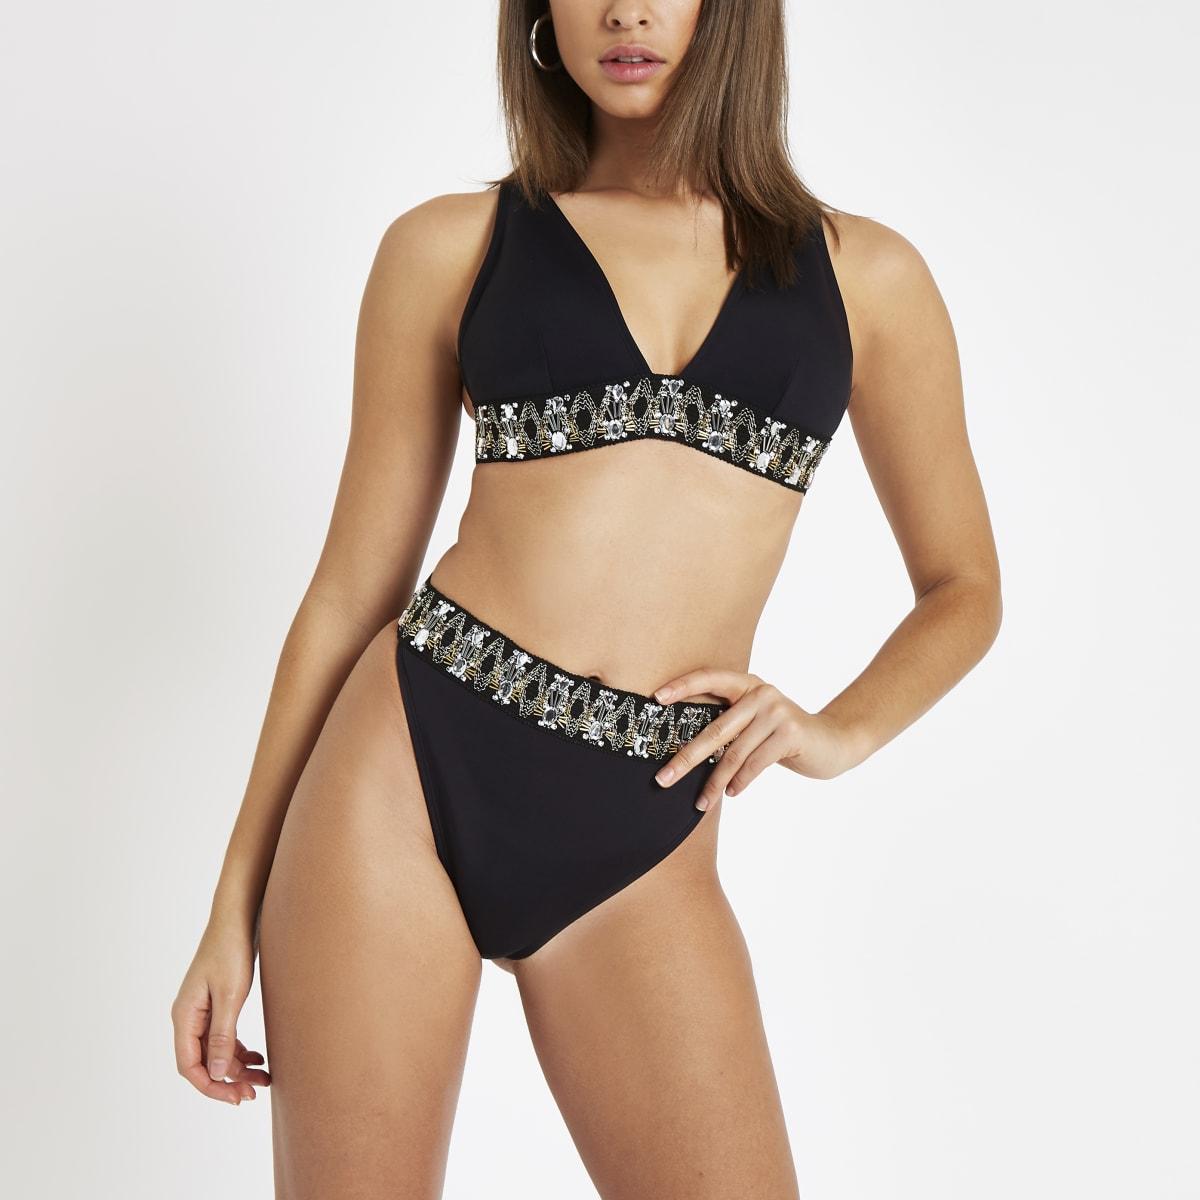 Zwart verfraaid bikinibroekje met hoge taille